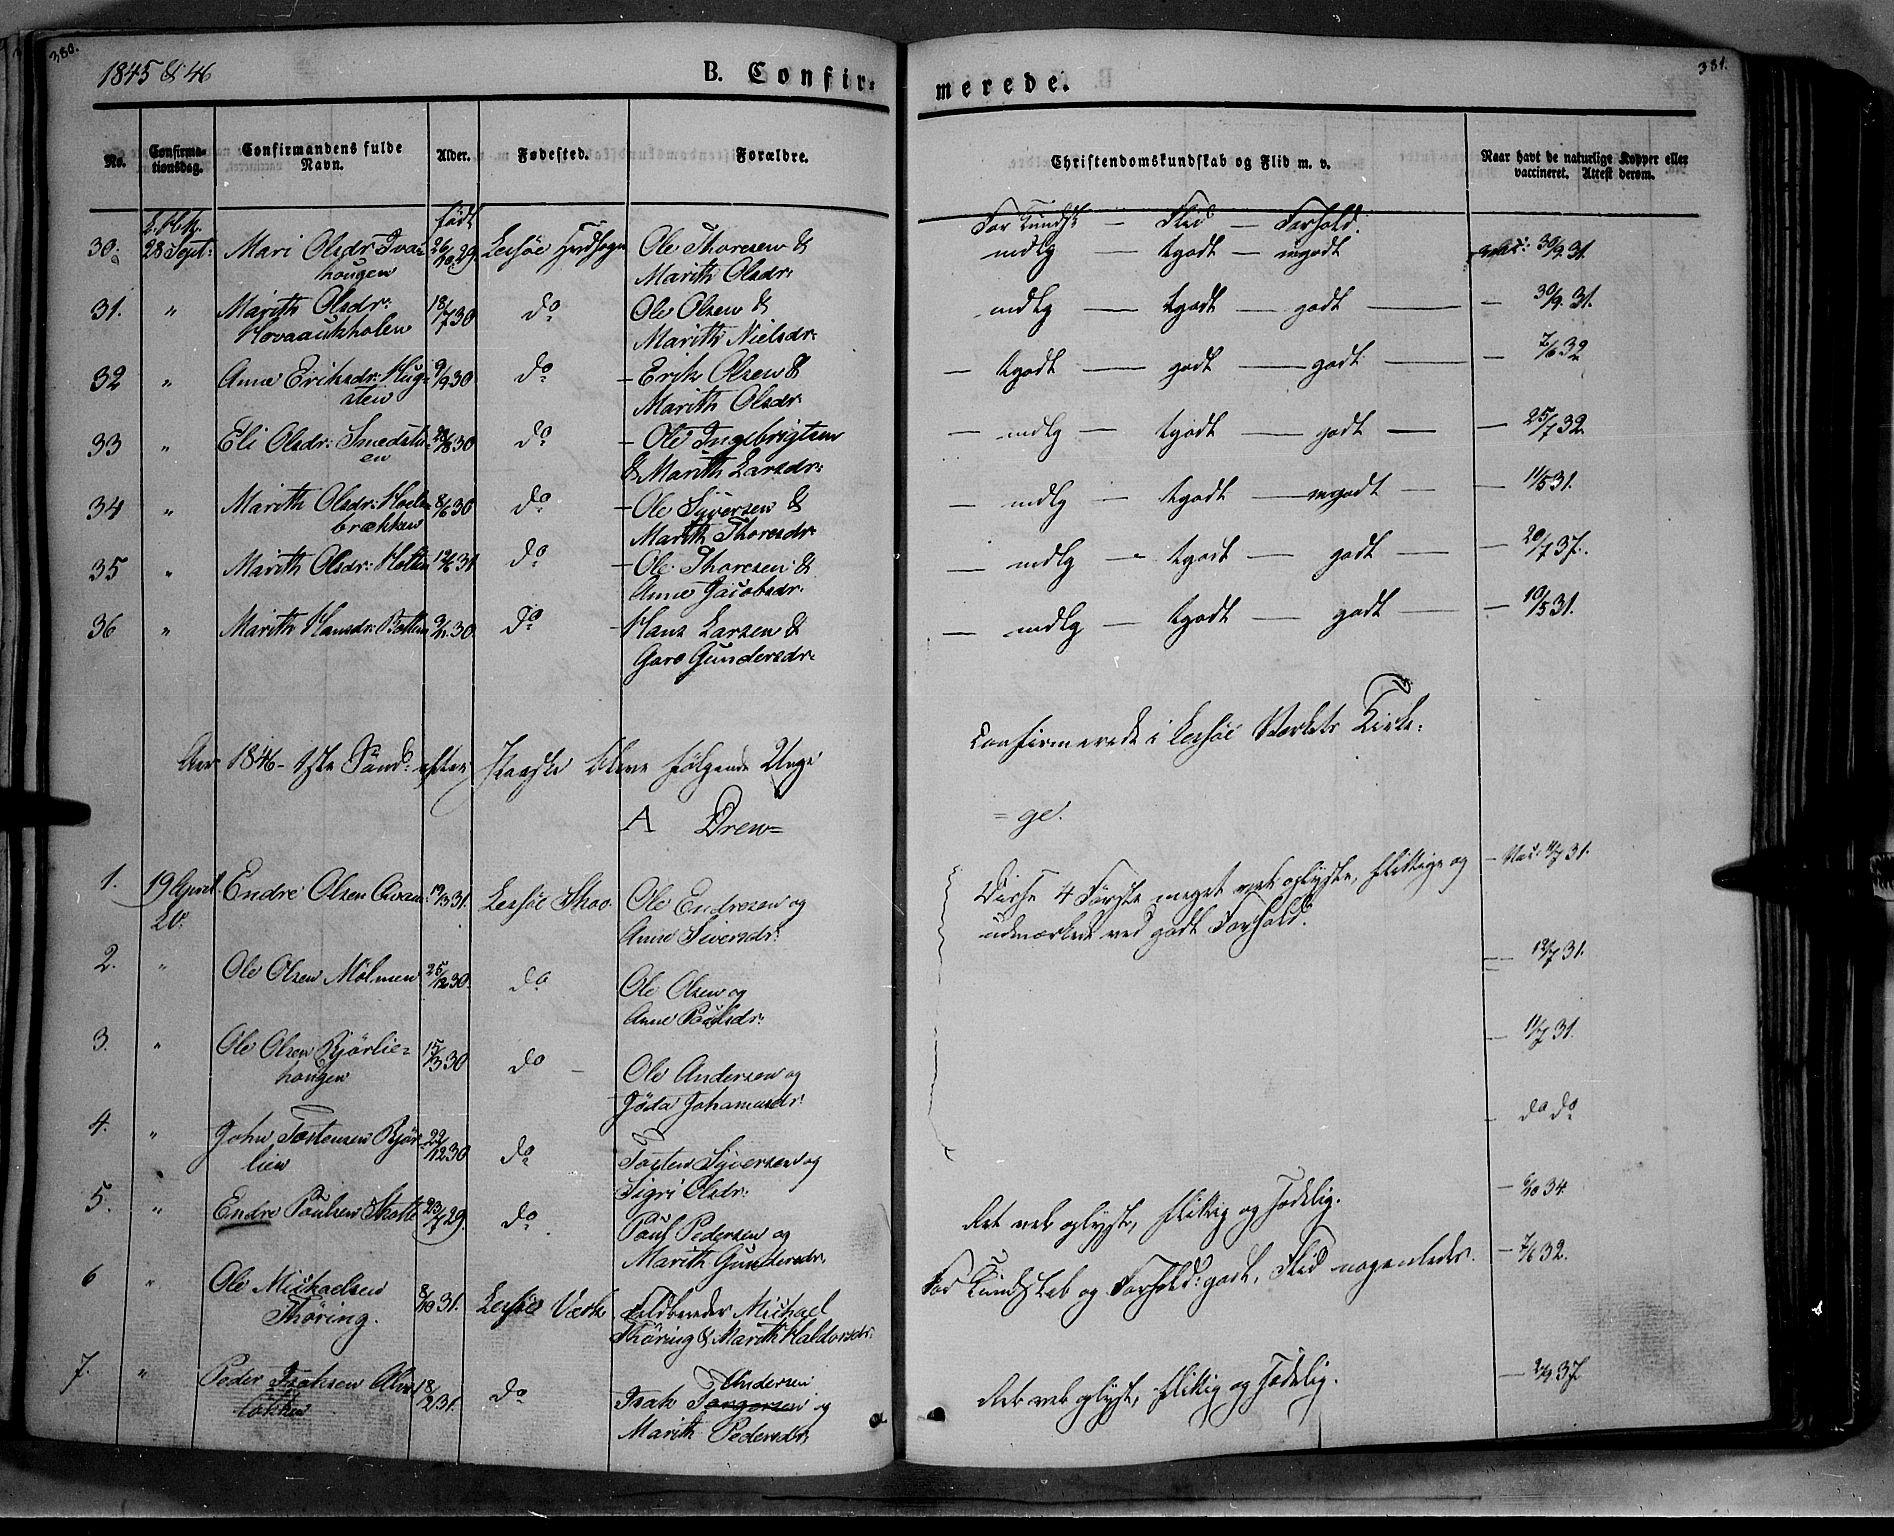 SAH, Lesja prestekontor, Ministerialbok nr. 6A, 1843-1854, s. 380-381